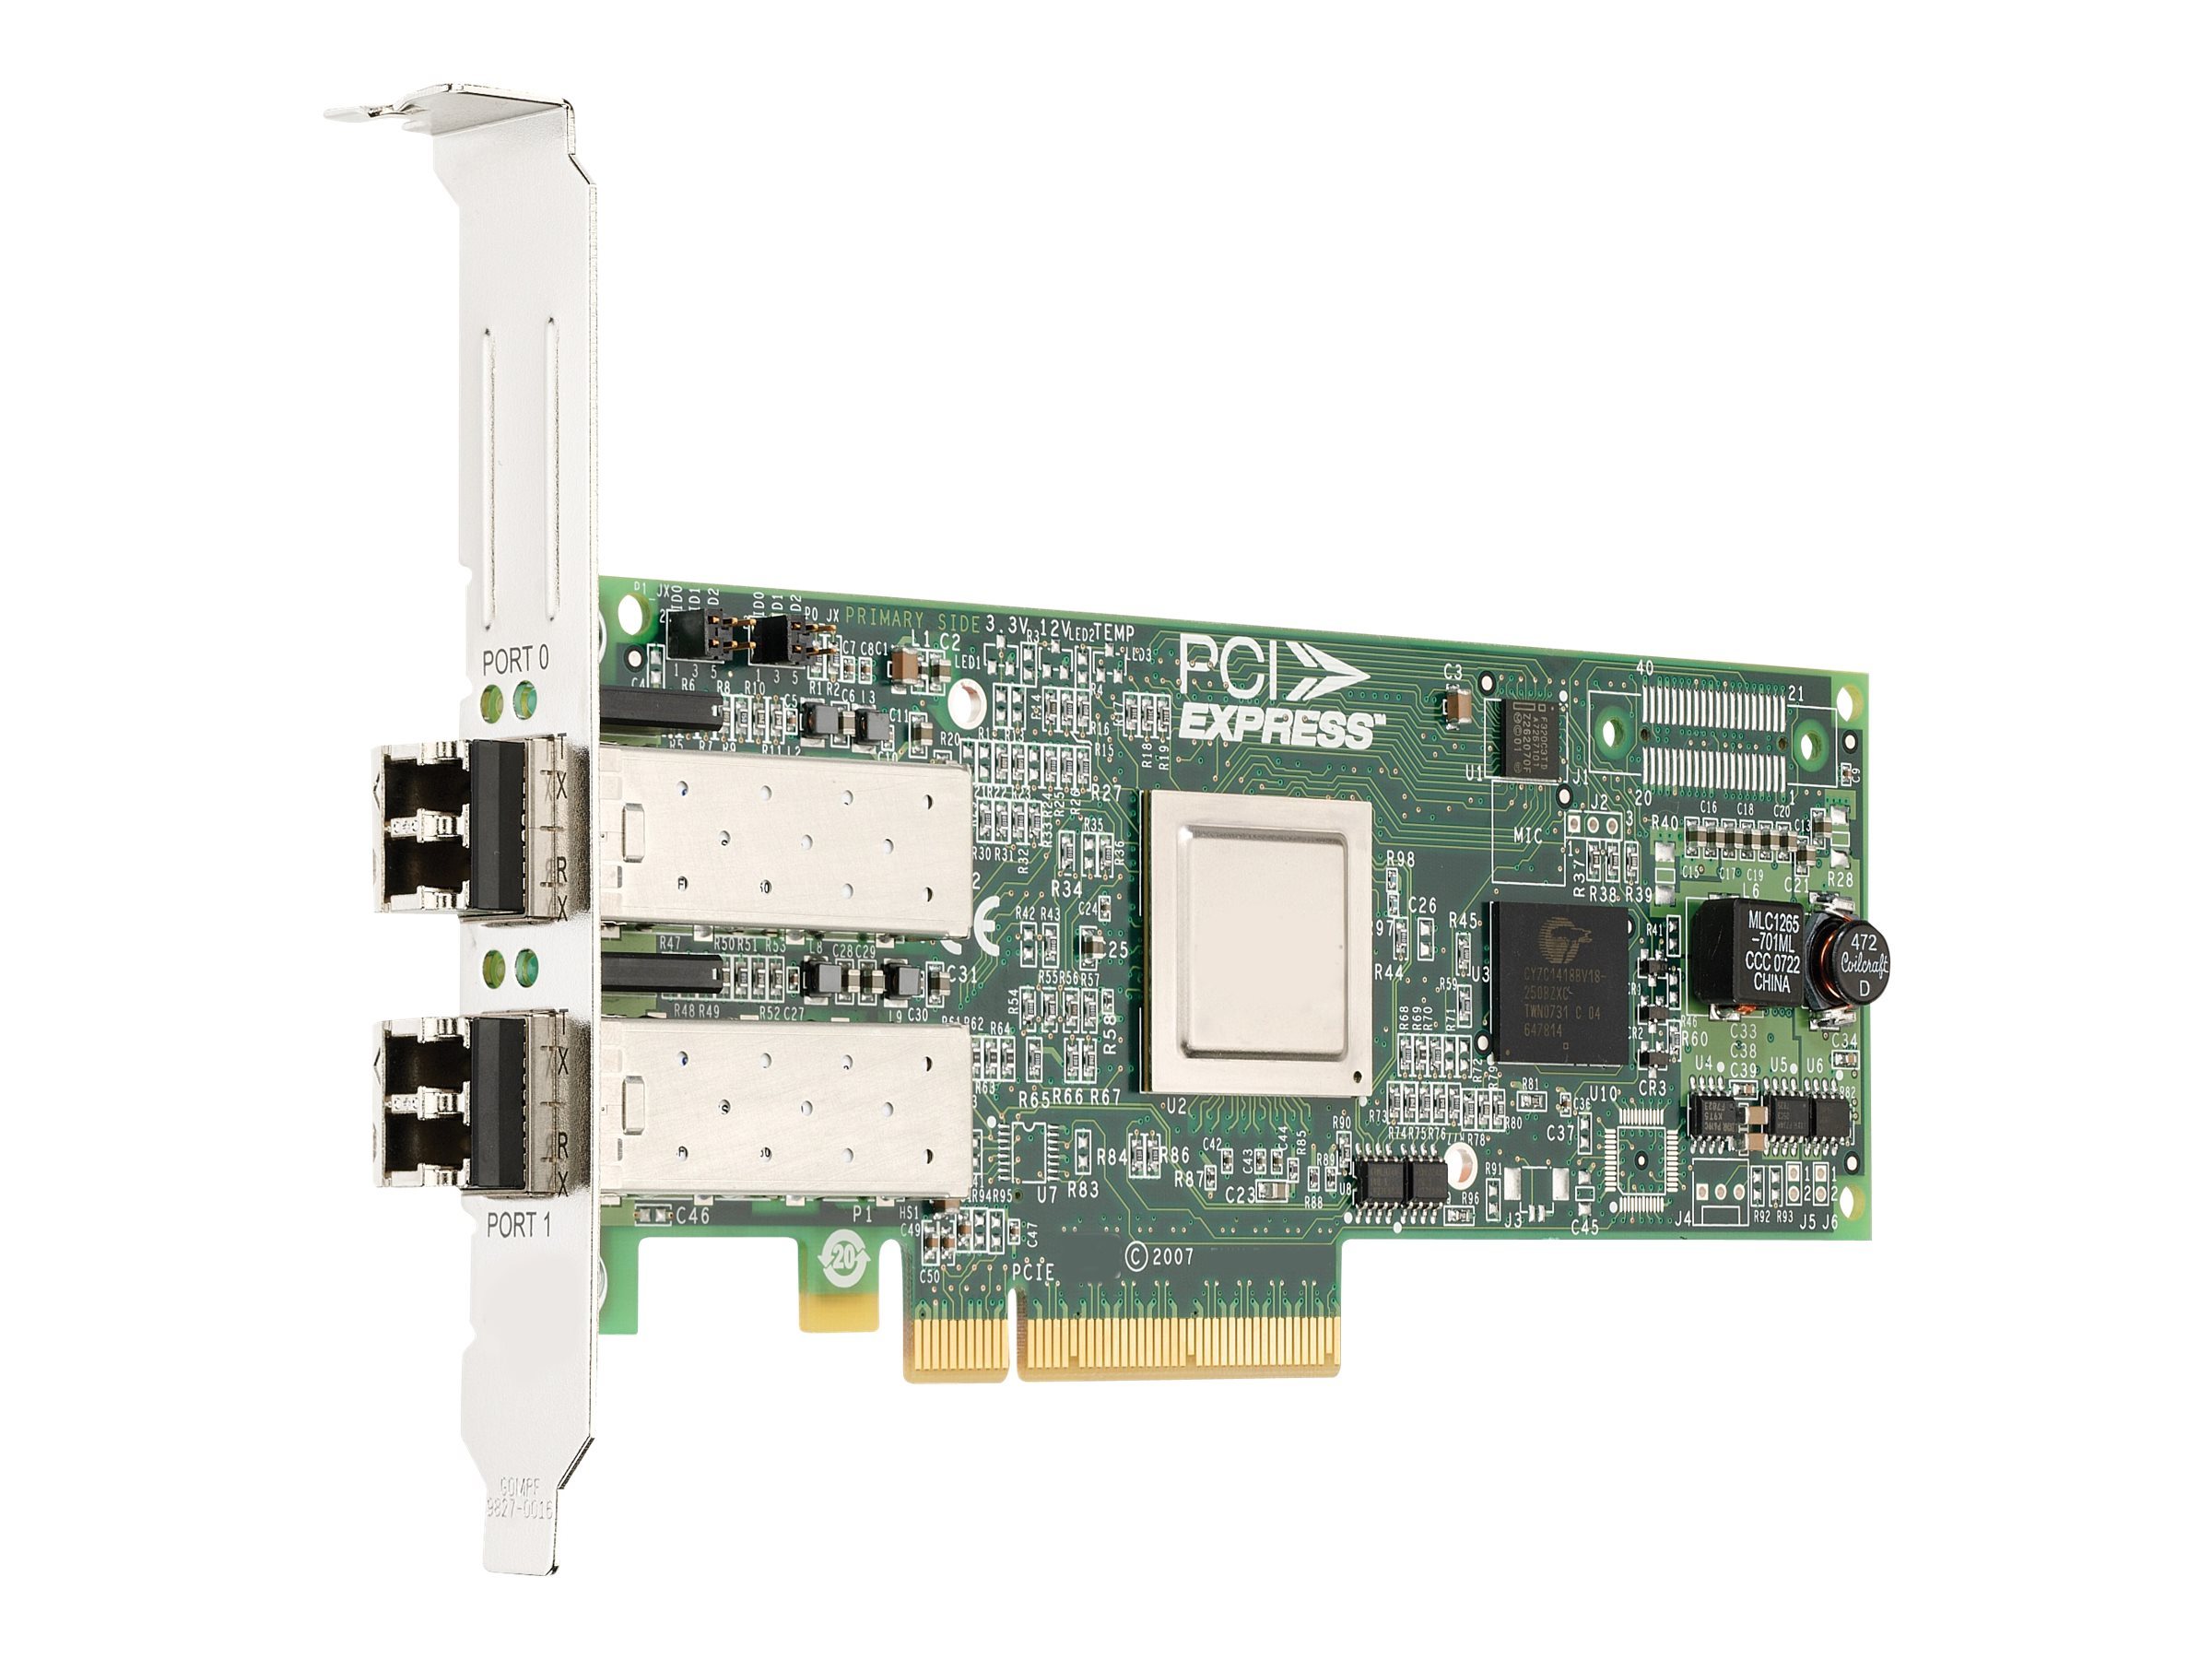 Emulex LPe12002-E (8Gb), single-port HBA (for EMC) - Hostbus-Adapter - 8Gb Fibre Channel x 2